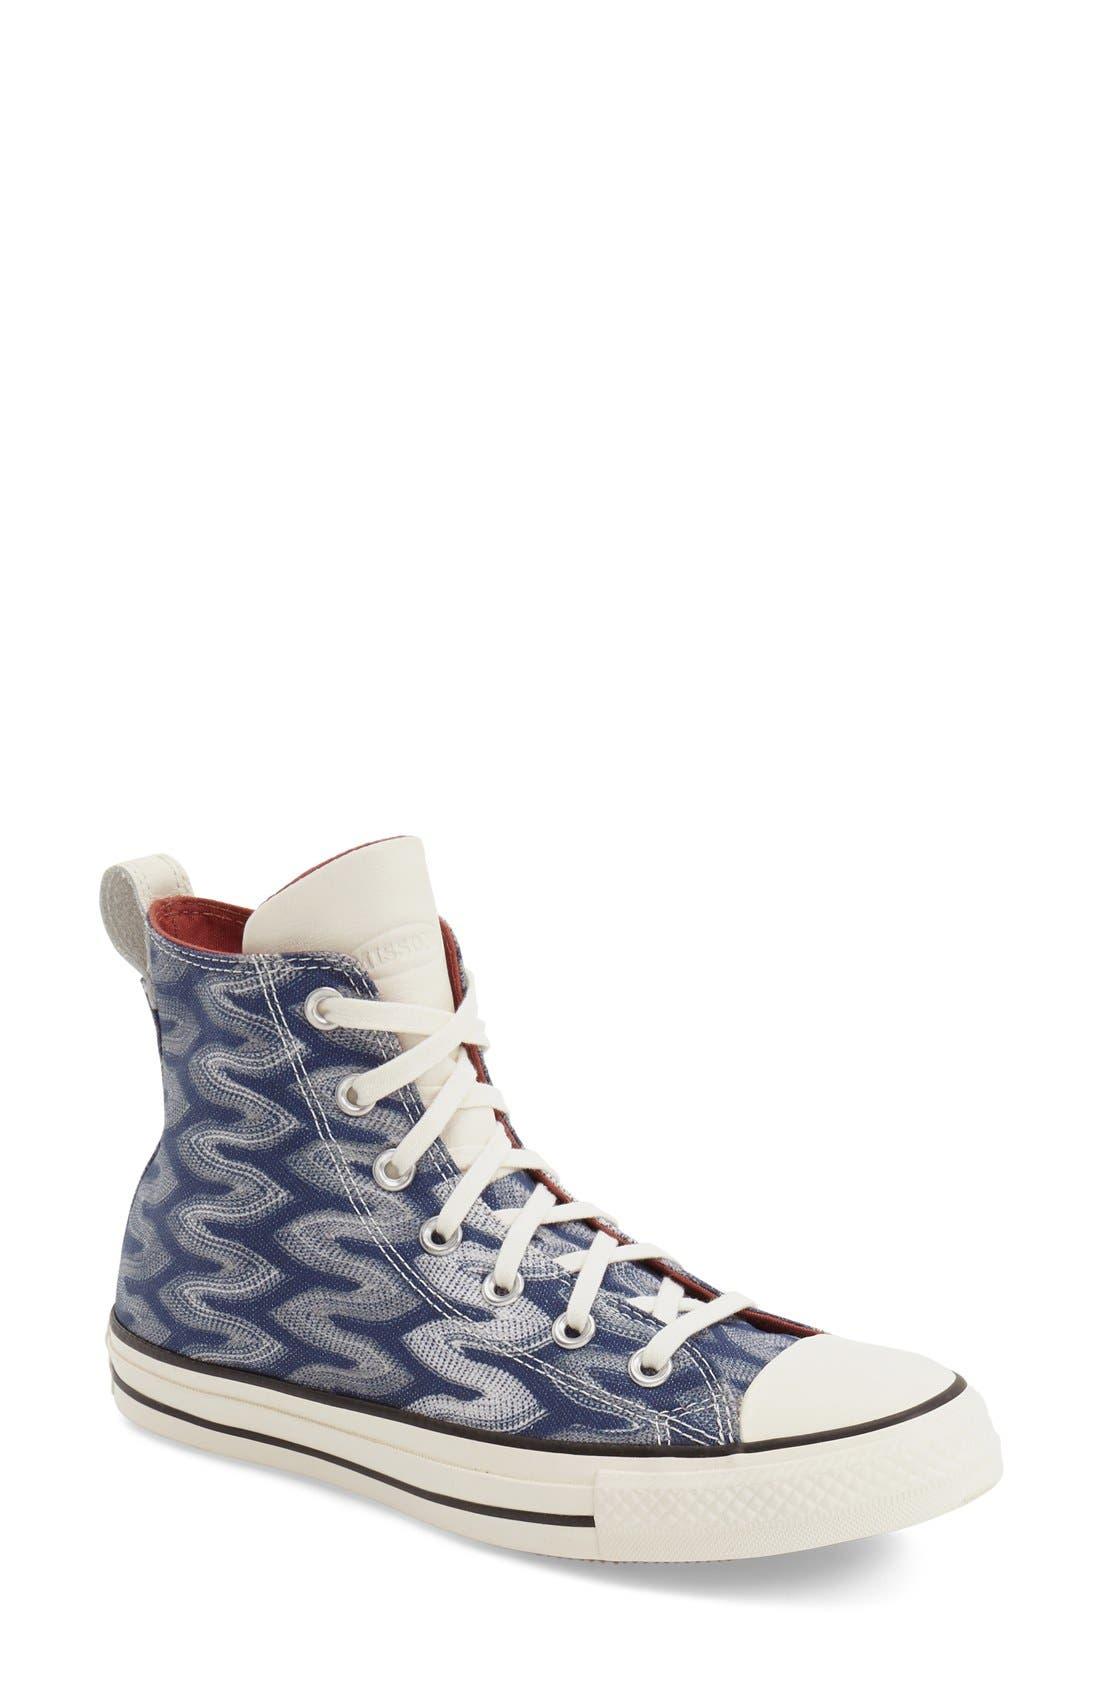 Main Image - Converse x Missoni Chuck Taylor® All Star® 'Flame' High Top Sneaker (Women)